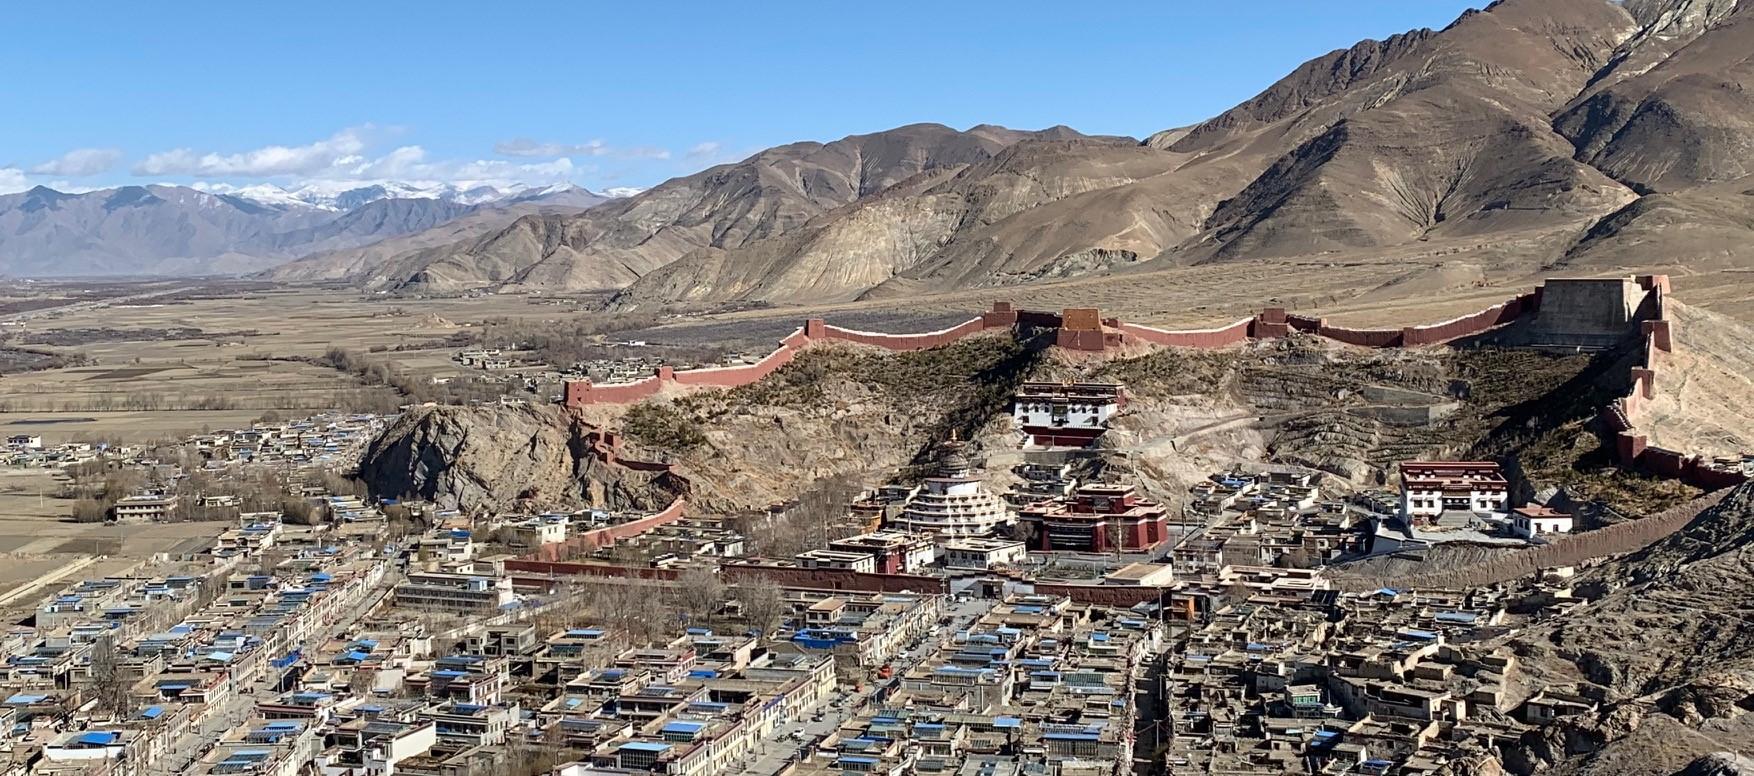 Panoramic view of the city of Gyantse, Tibet.